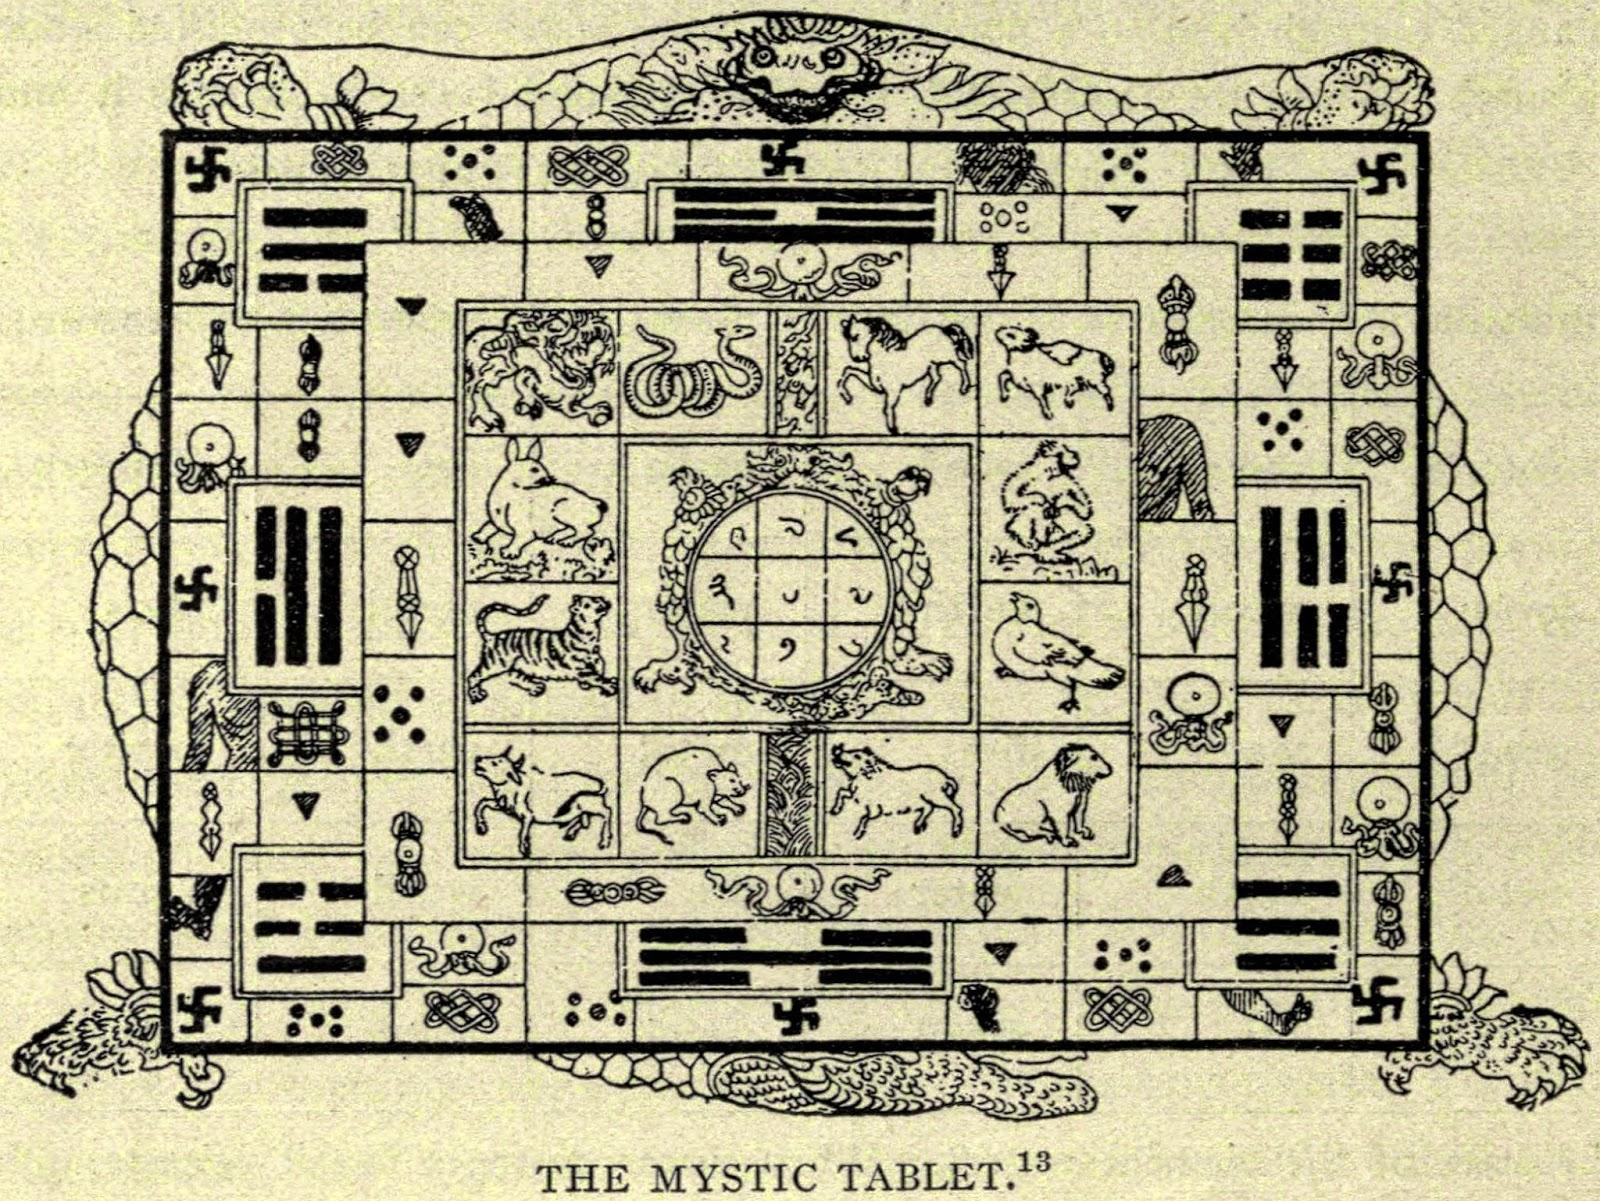 Mystic-table.jpg